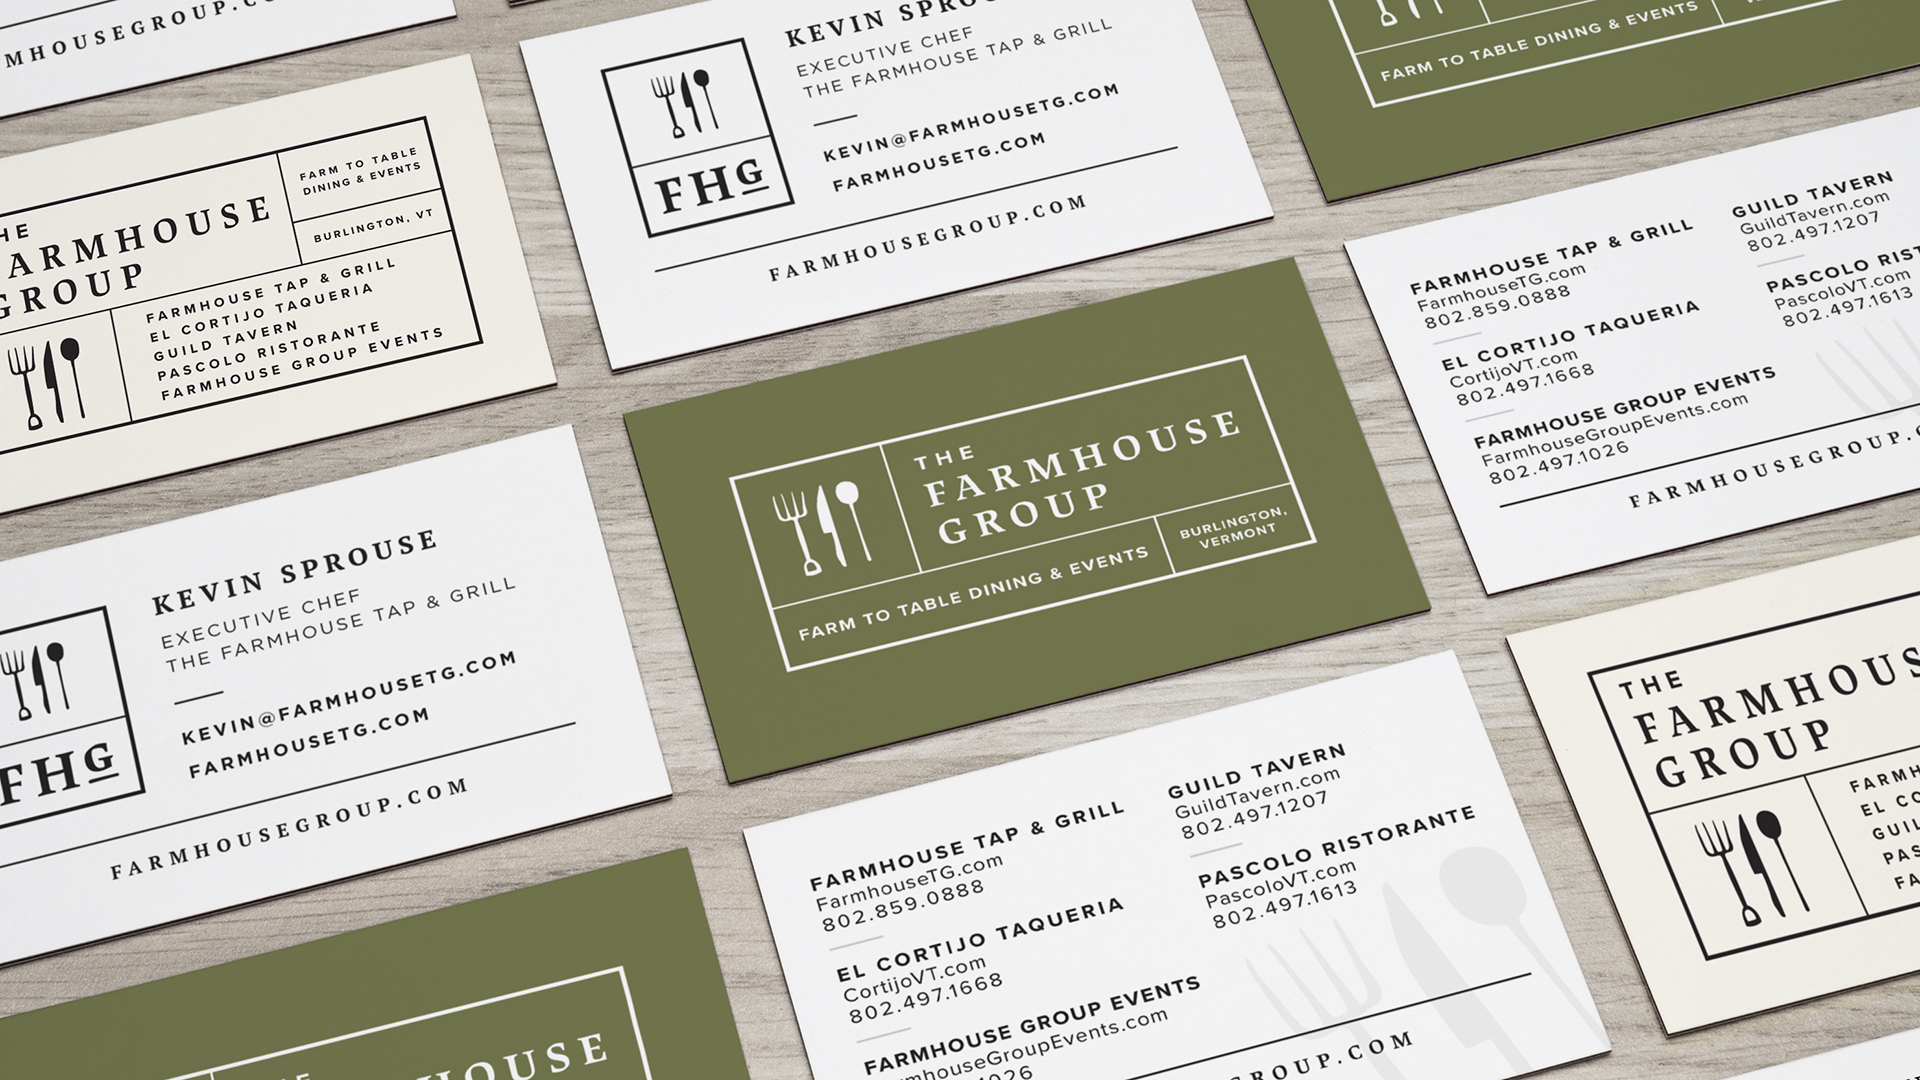 FHG_business-card-mockup_1920x1080.jpg